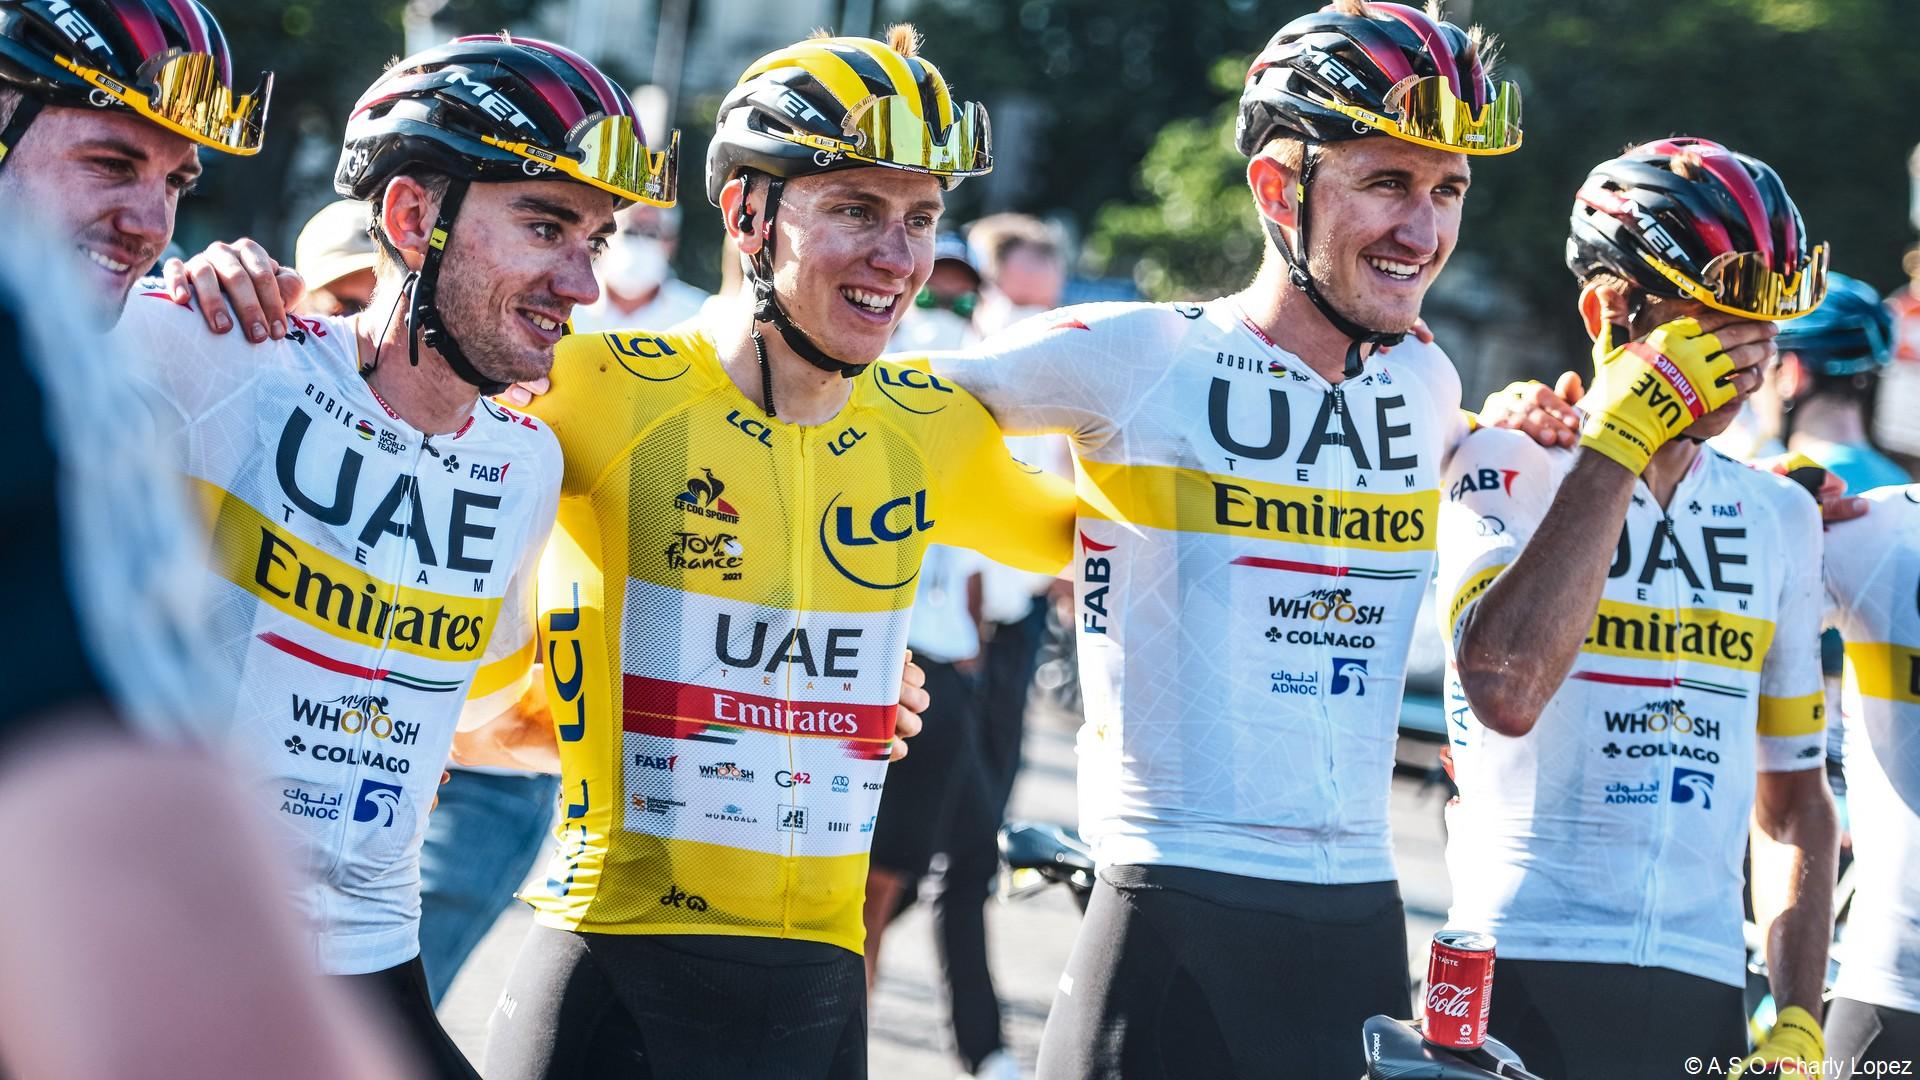 Tadej Pogacar Tour de France 2021 (c) ASO Charly Lopez